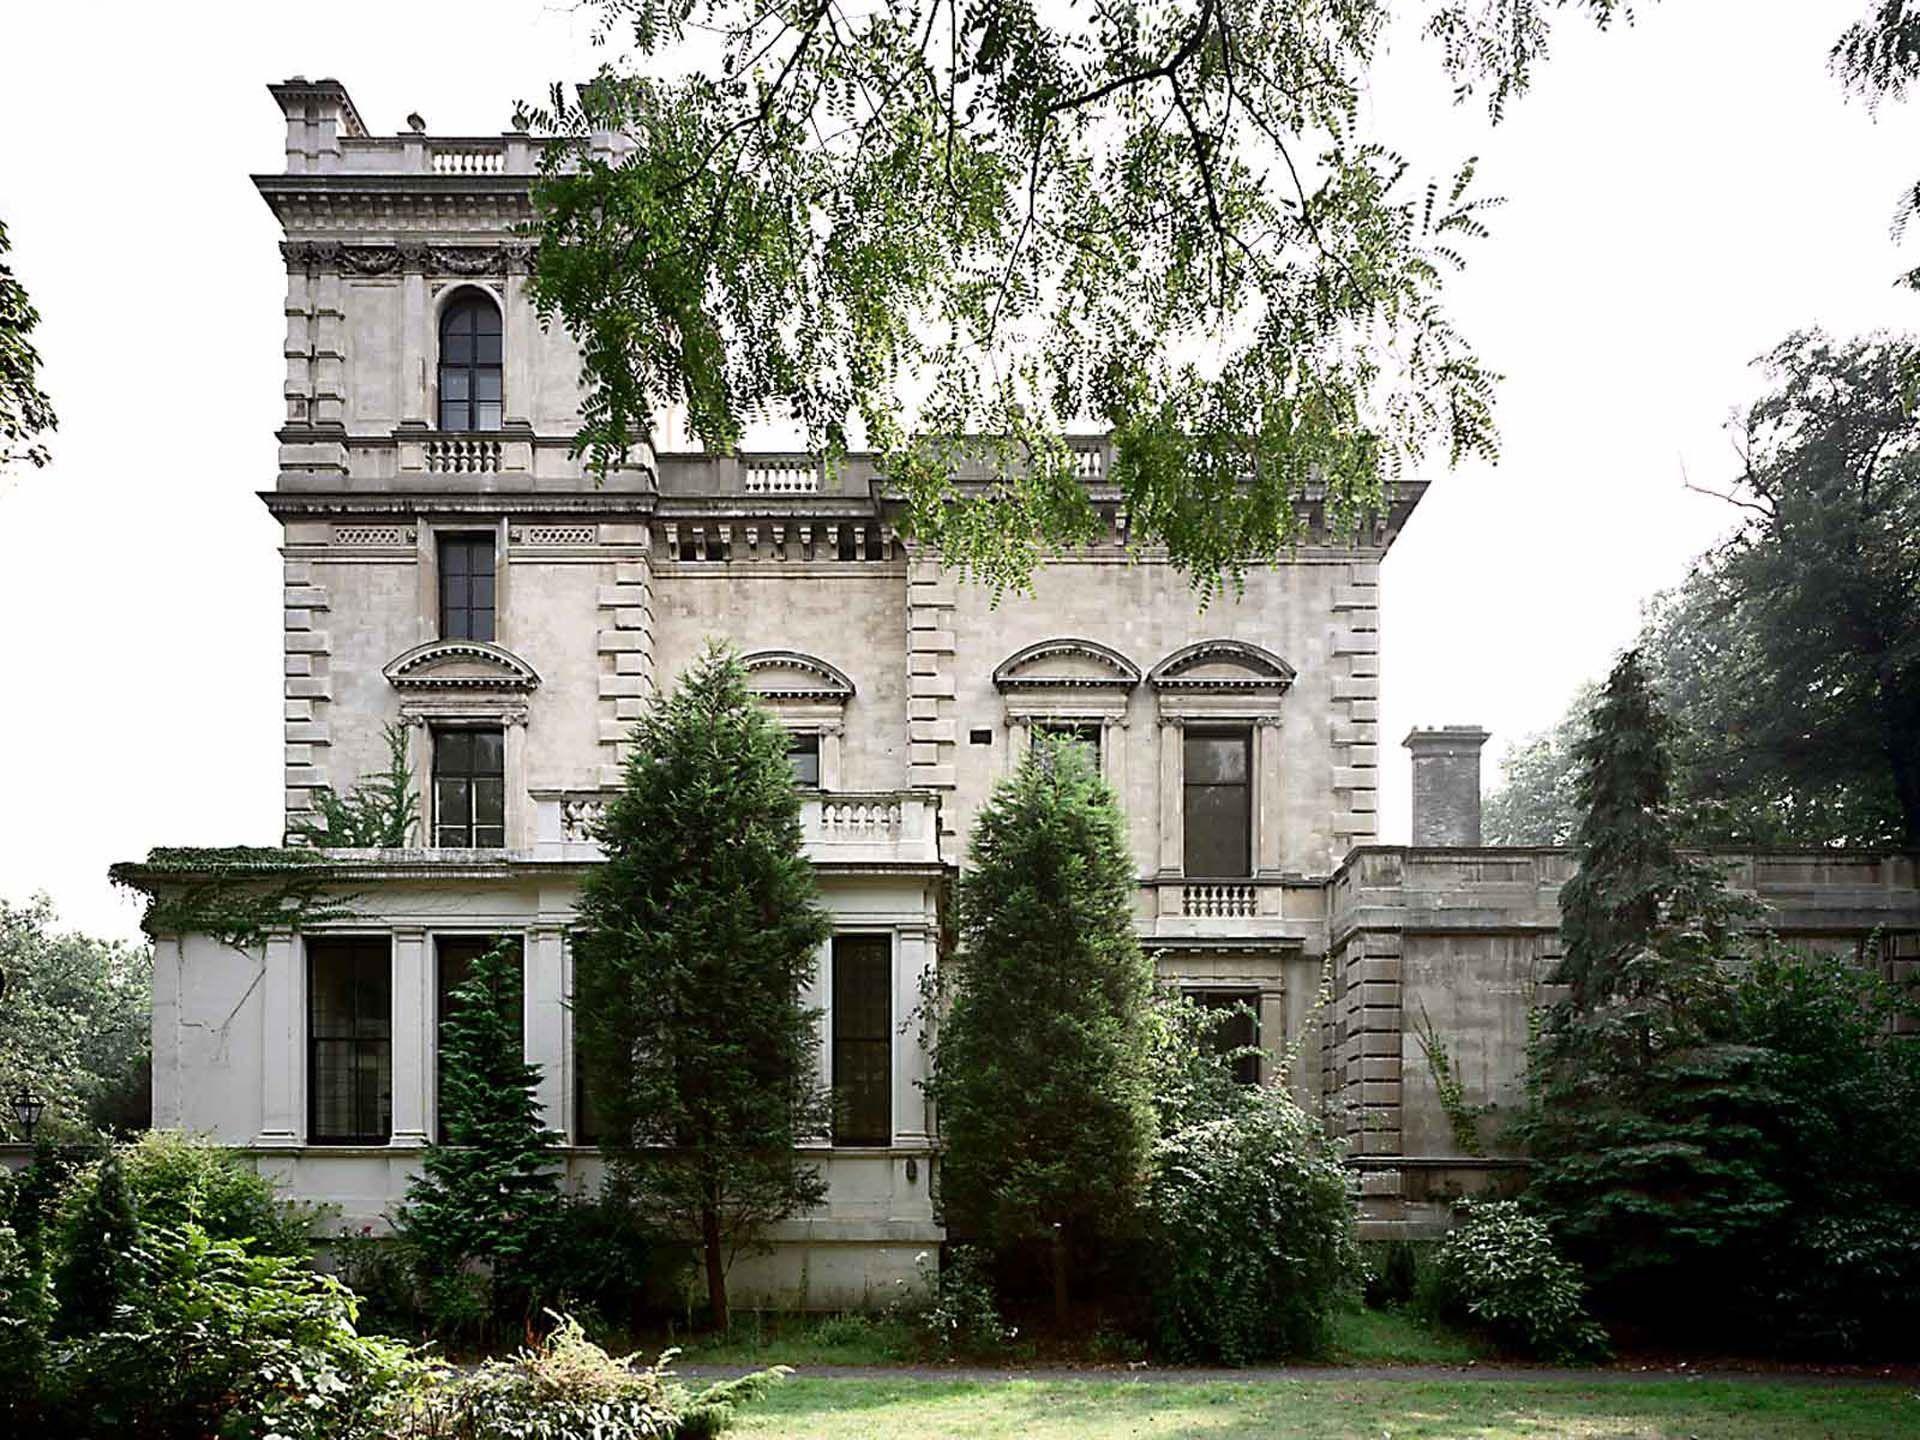 c5ba2769ffe333abffdd1dfe23cfe72d - Kensington Palace Gardens London Real Estate